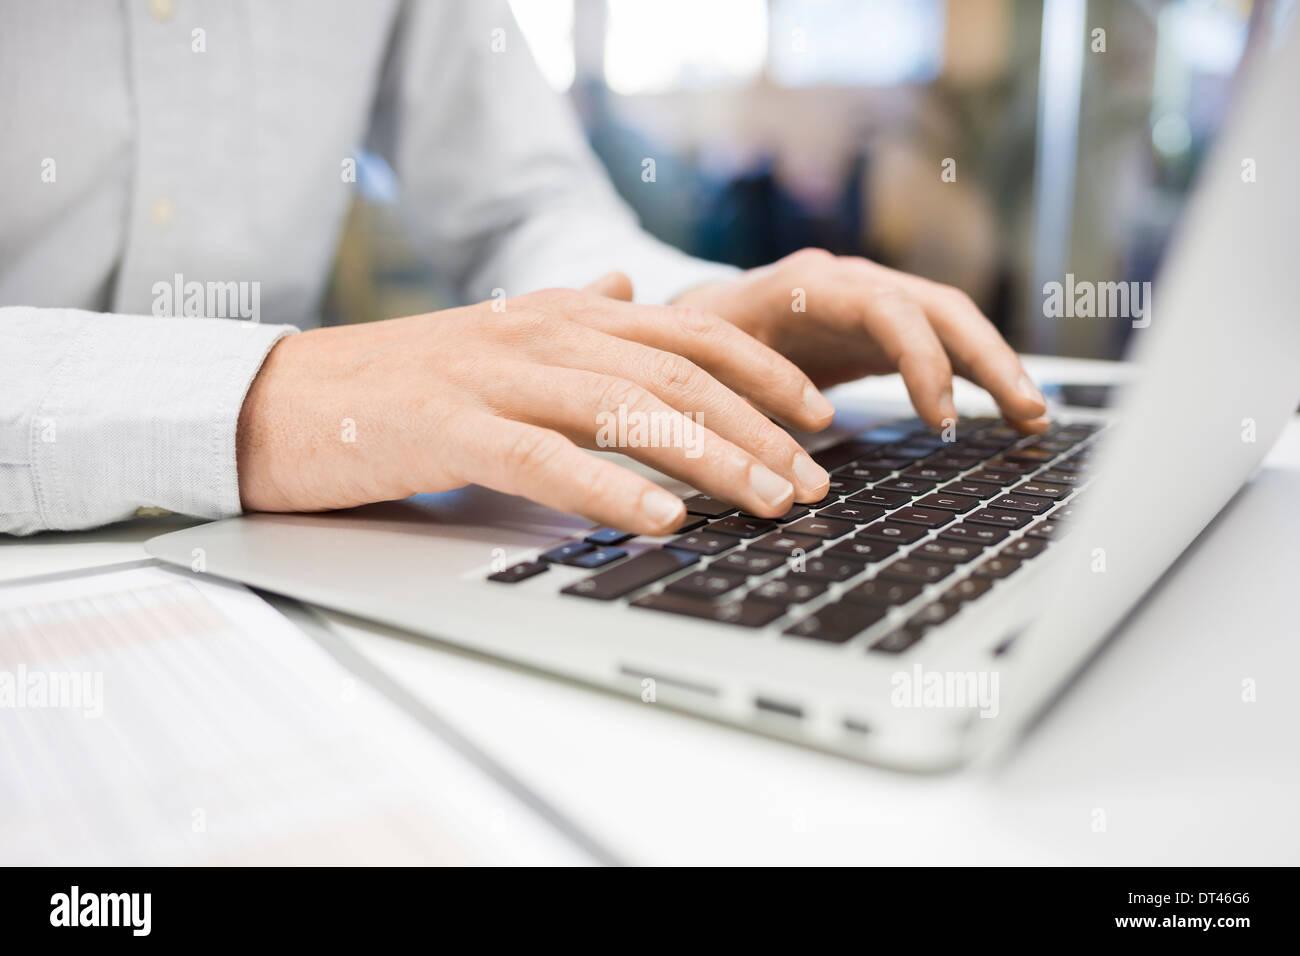 Male computer hands fingers desk - Stock Image